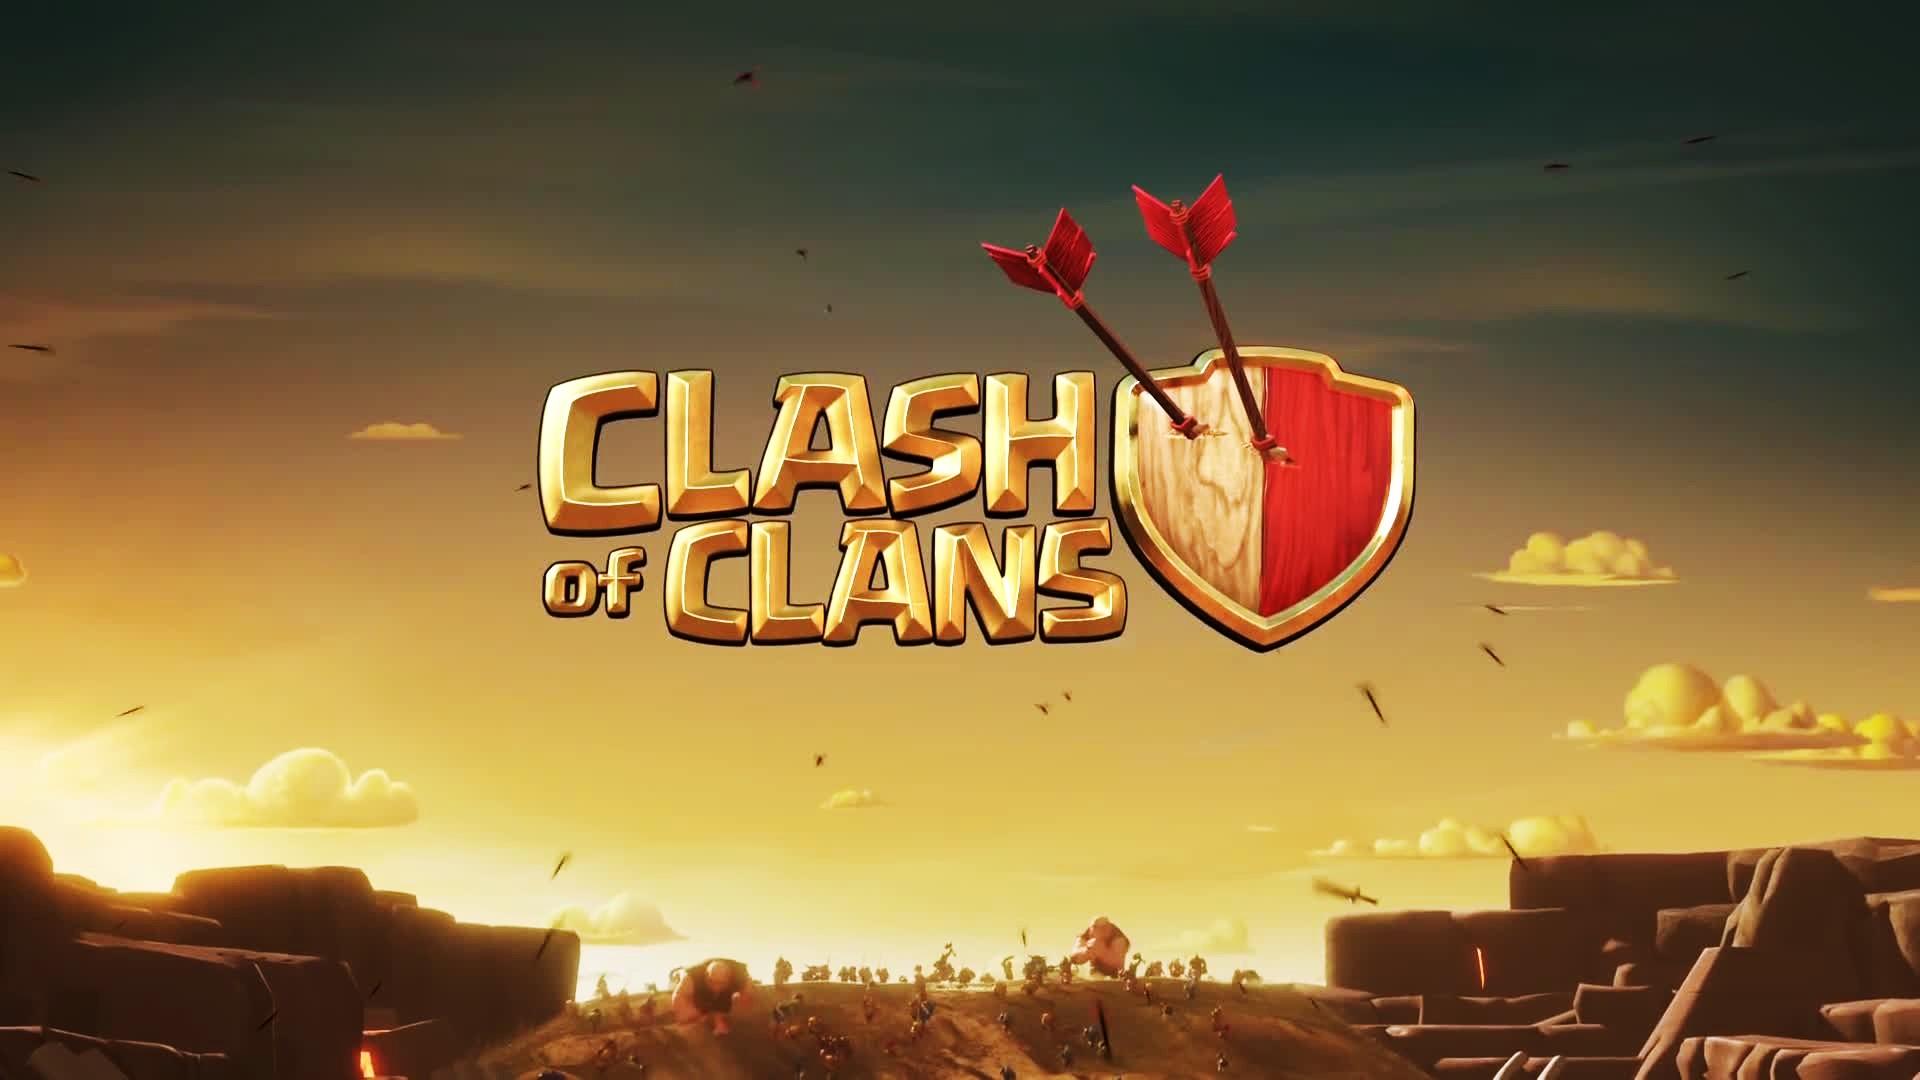 Clash of Clans HQ Desktop Wallpaper 15986   Baltana 1920x1080